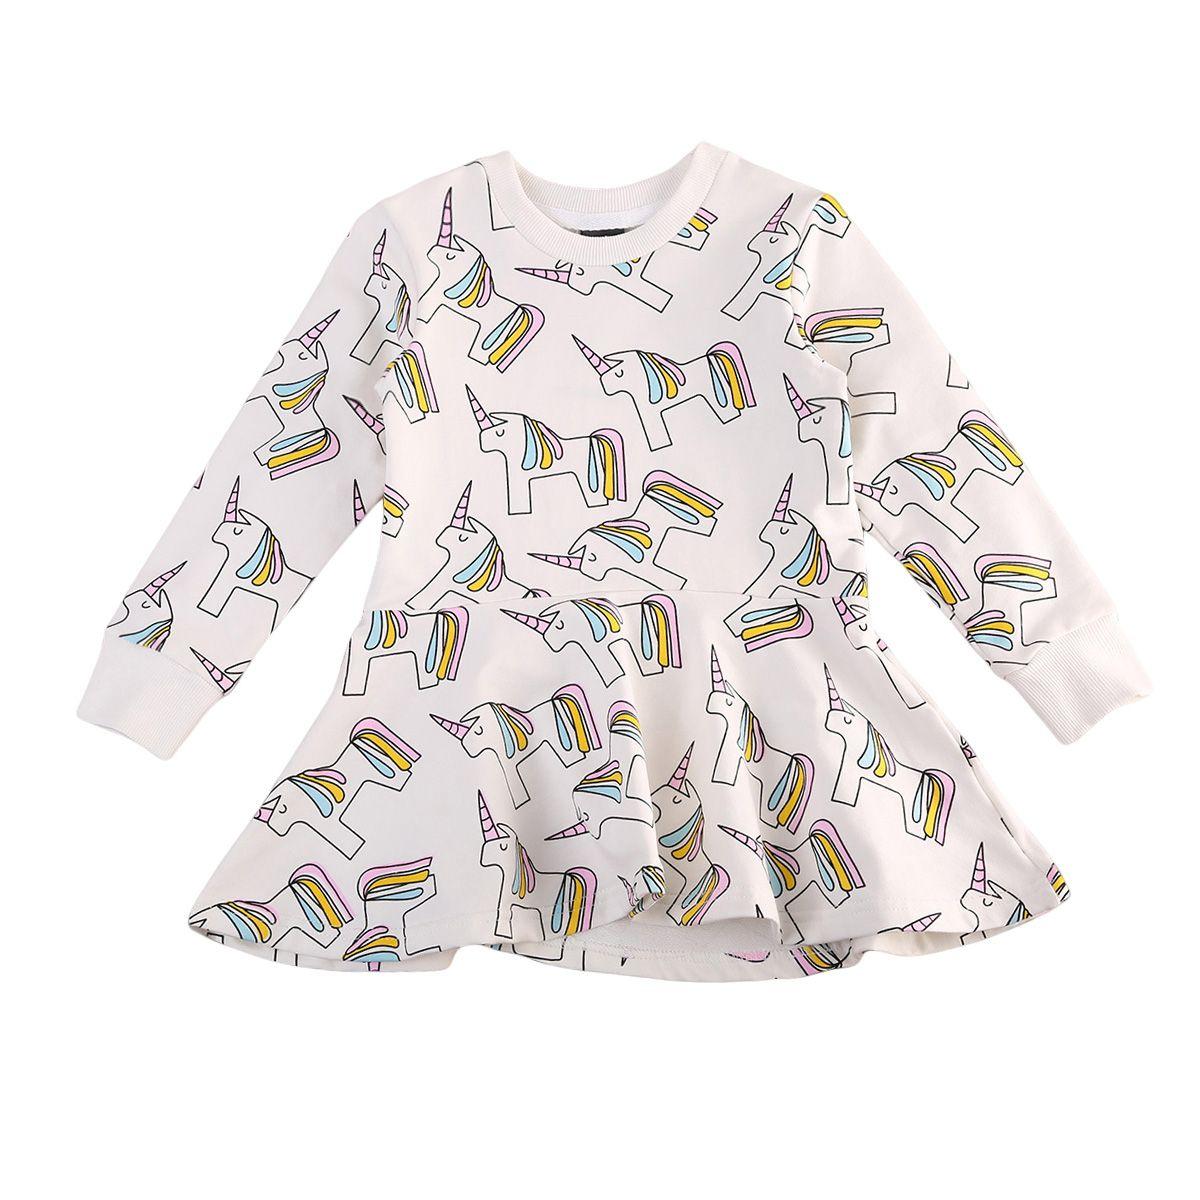 2019 Girls Unicorn Dress Shirts Pants Suits Boys Clothing Set Cotton